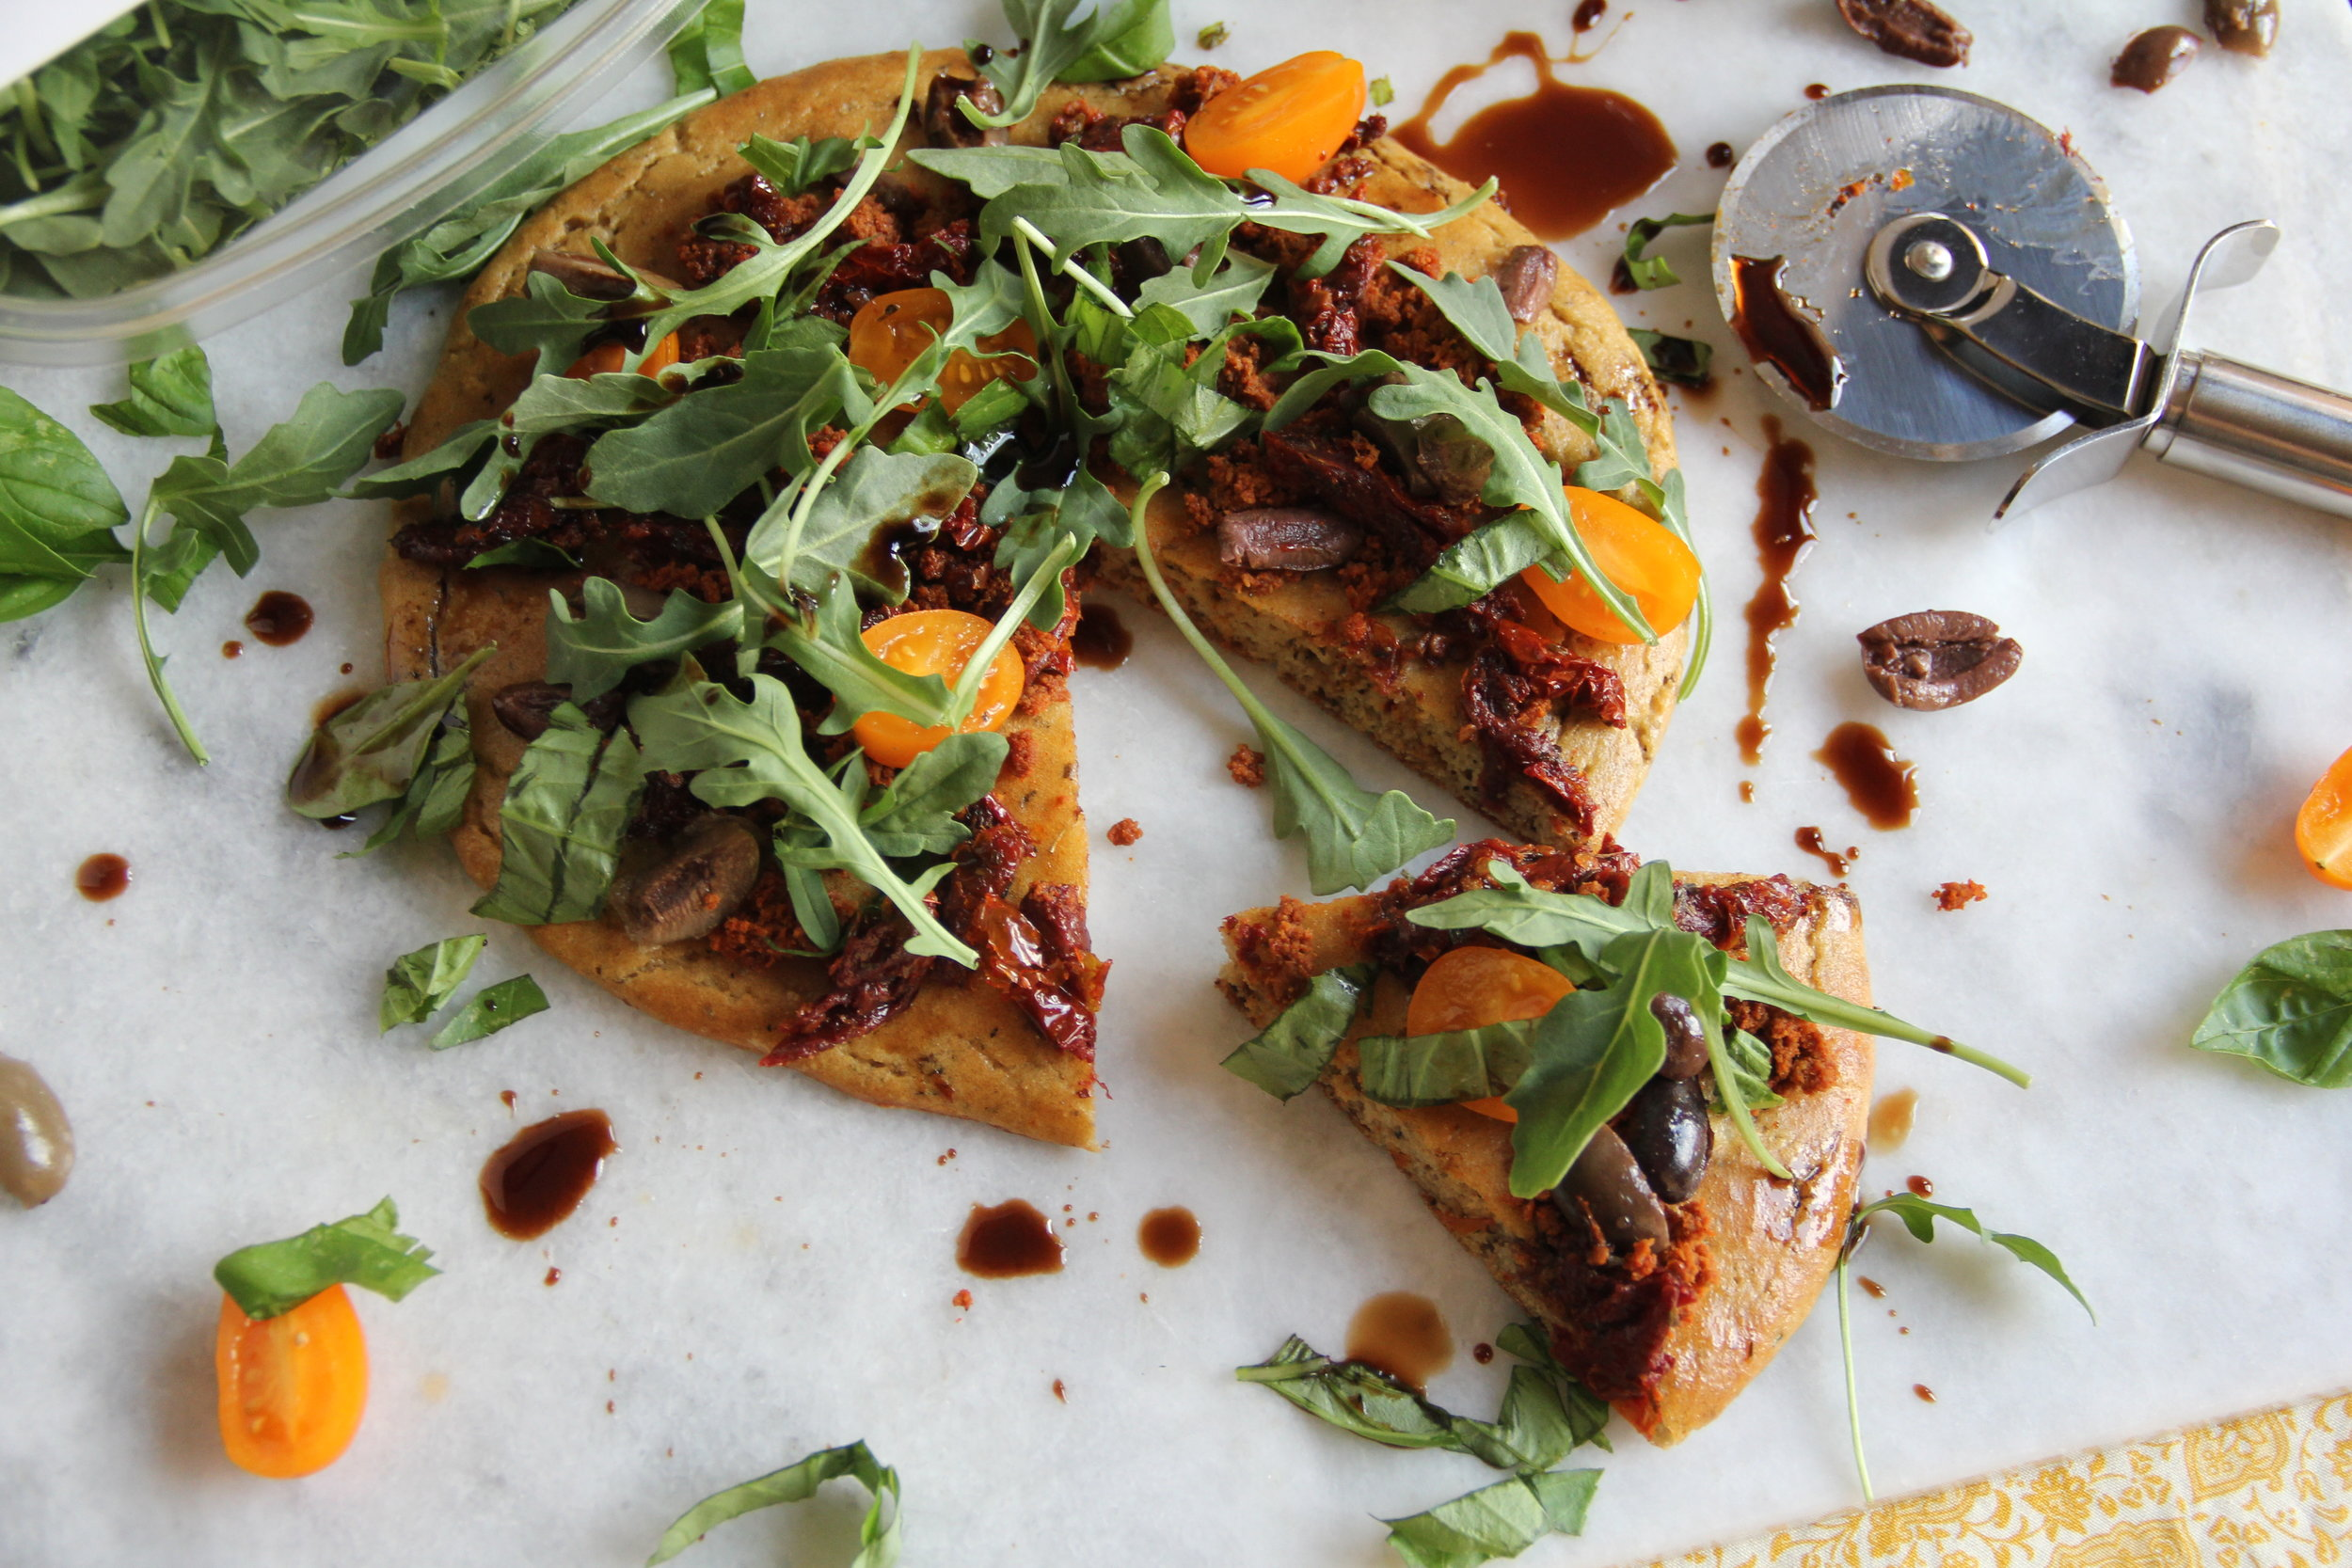 Paleo Flatbread Pizza